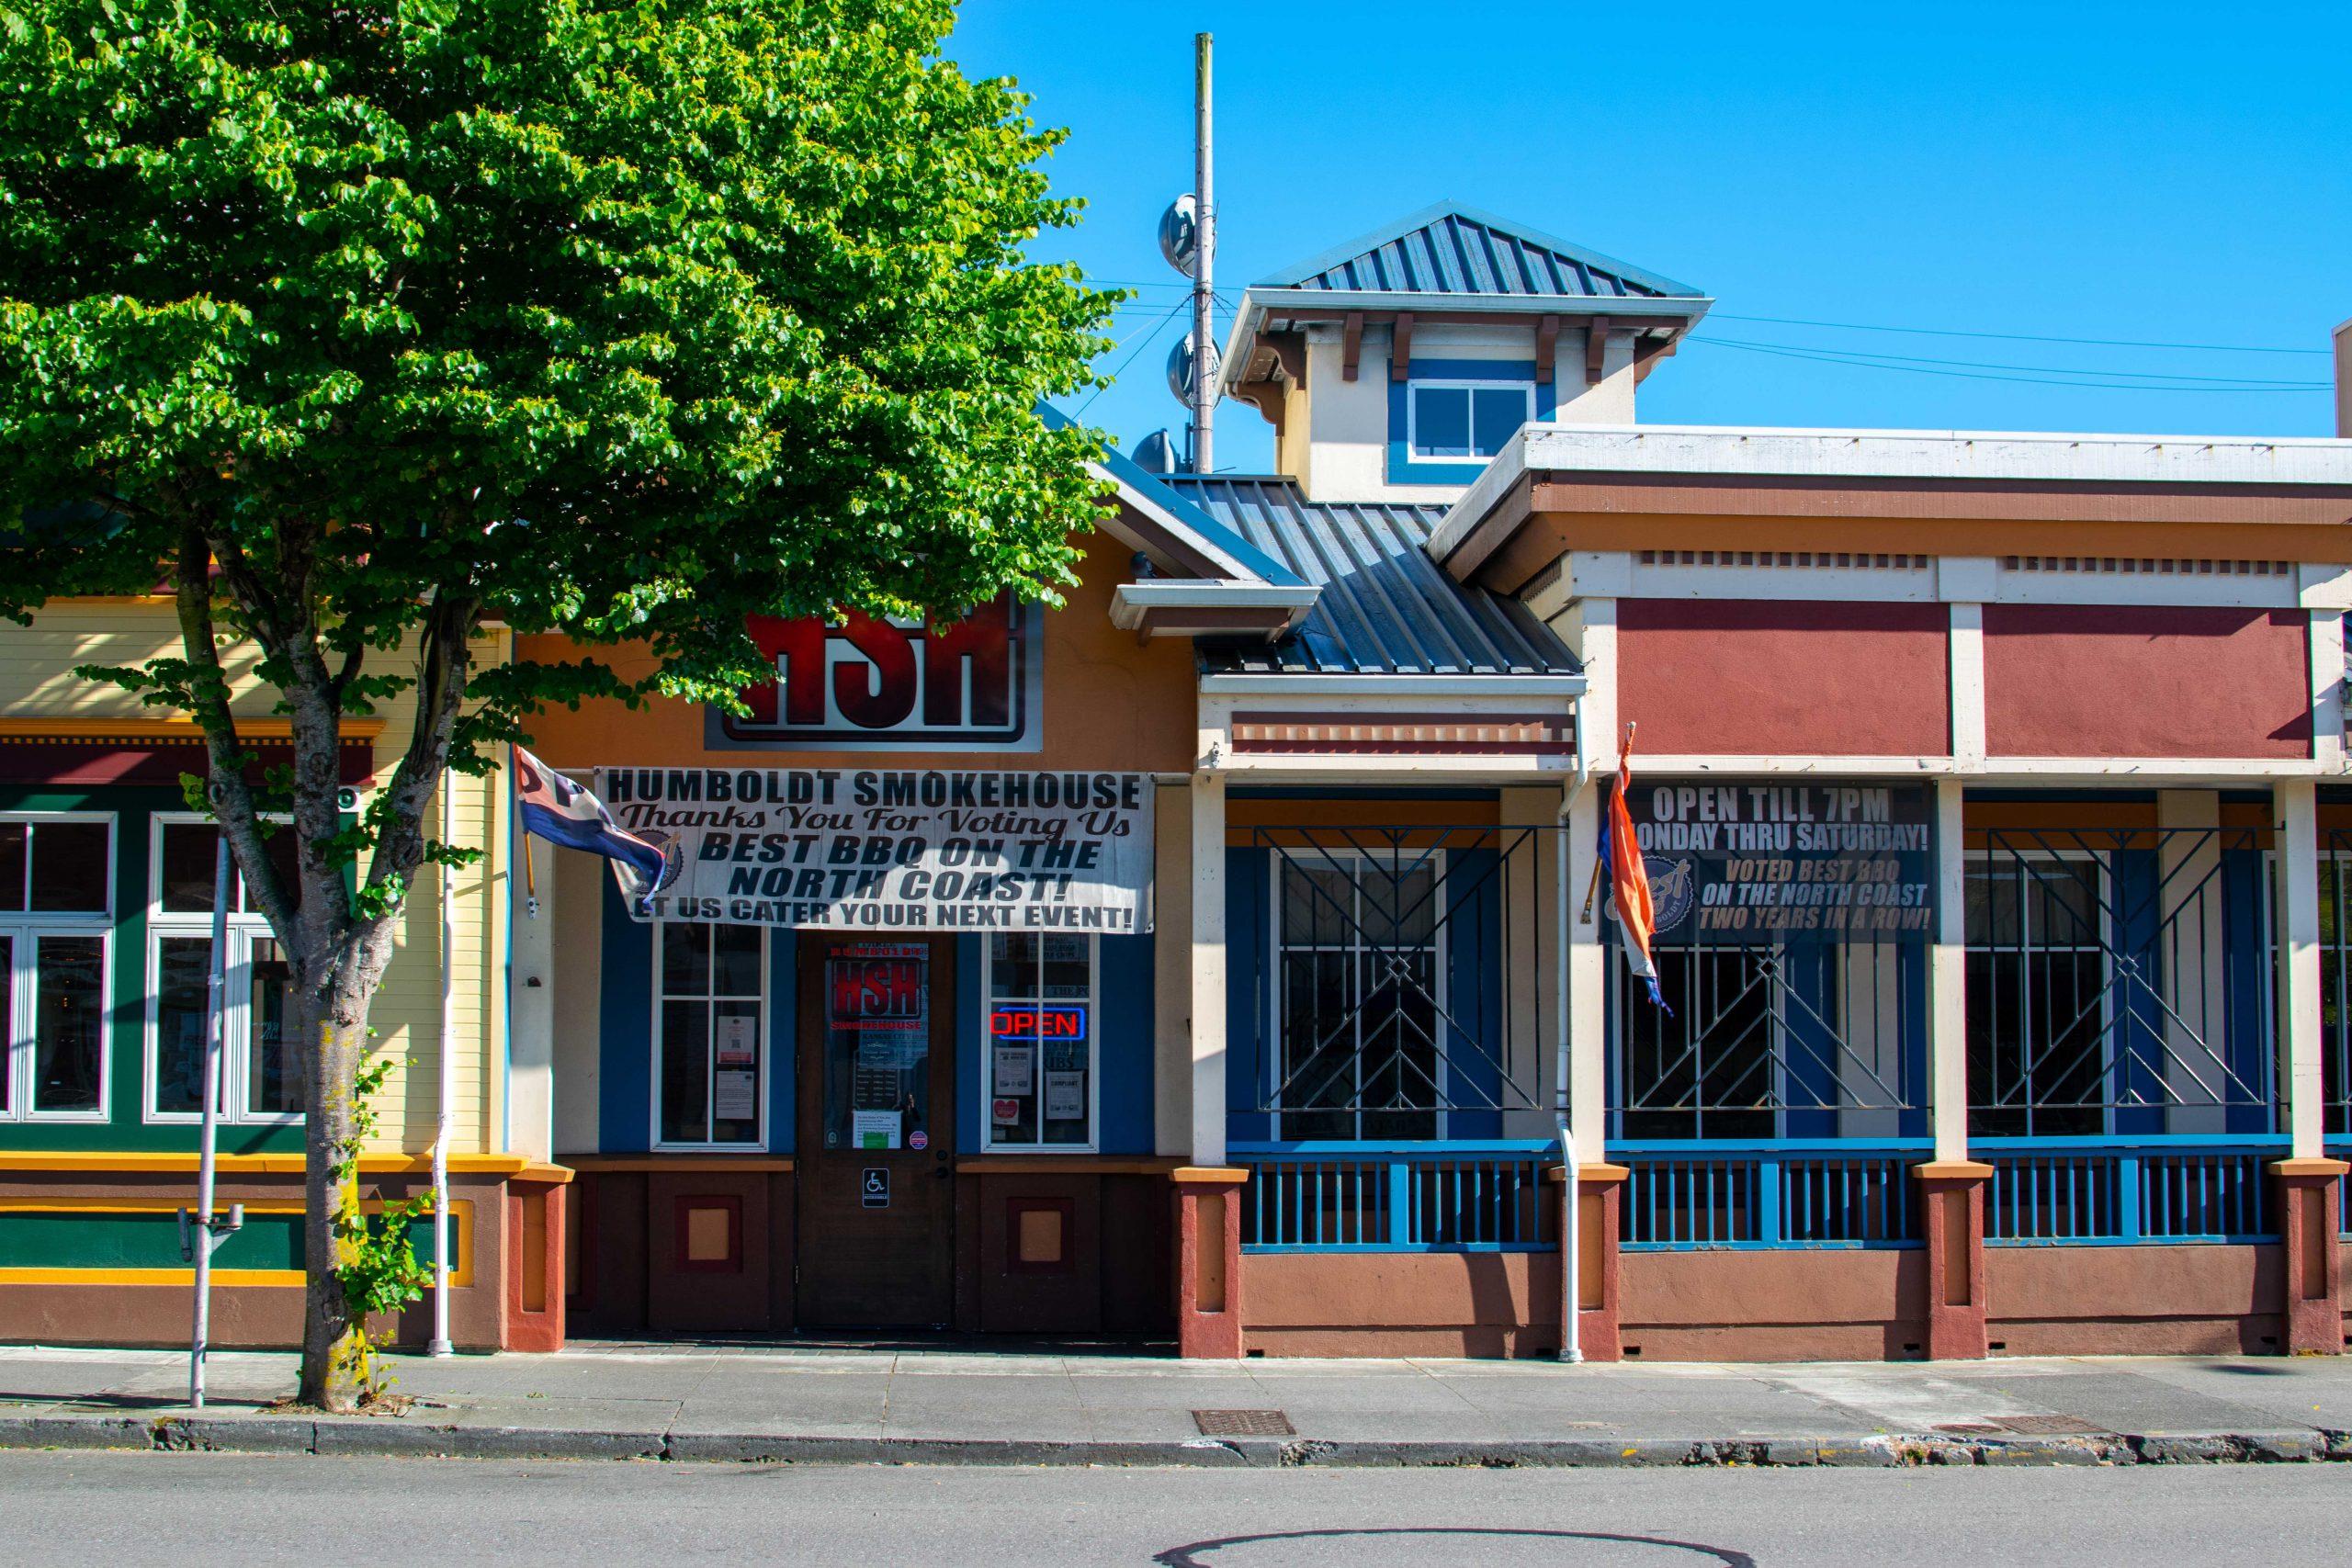 Humboldt Smokehouse